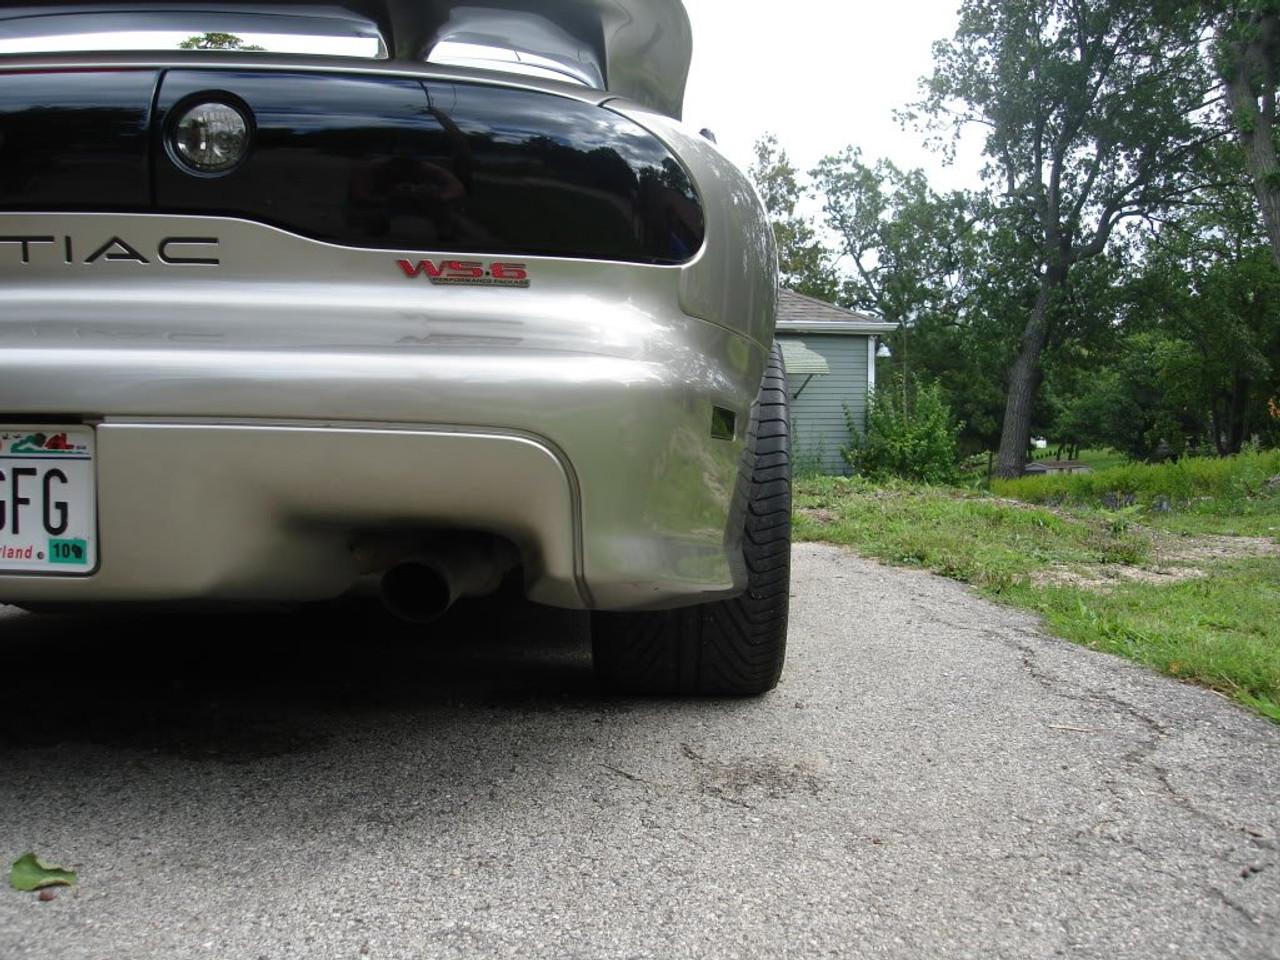 Pontiac Firebird Trans Am Tinted Tinted Tail Lights Smoked Overlays Film Covers